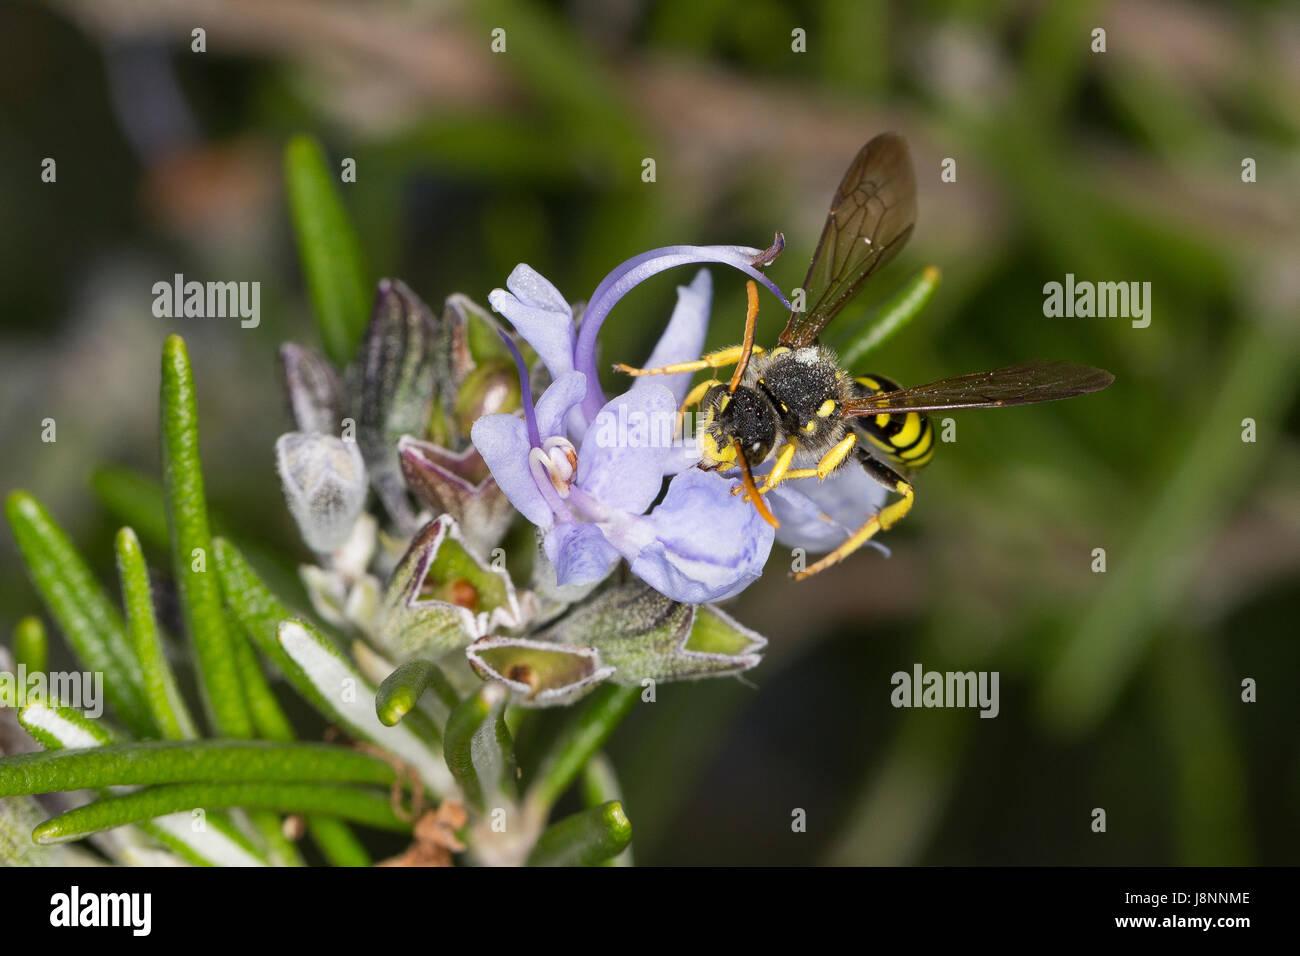 Gegürtete Wespenbiene, Wespenbiene, Männchen, Wespenbienen, Nomada succincta, Yellow-Legged Nomad-Bee, - Stock Image